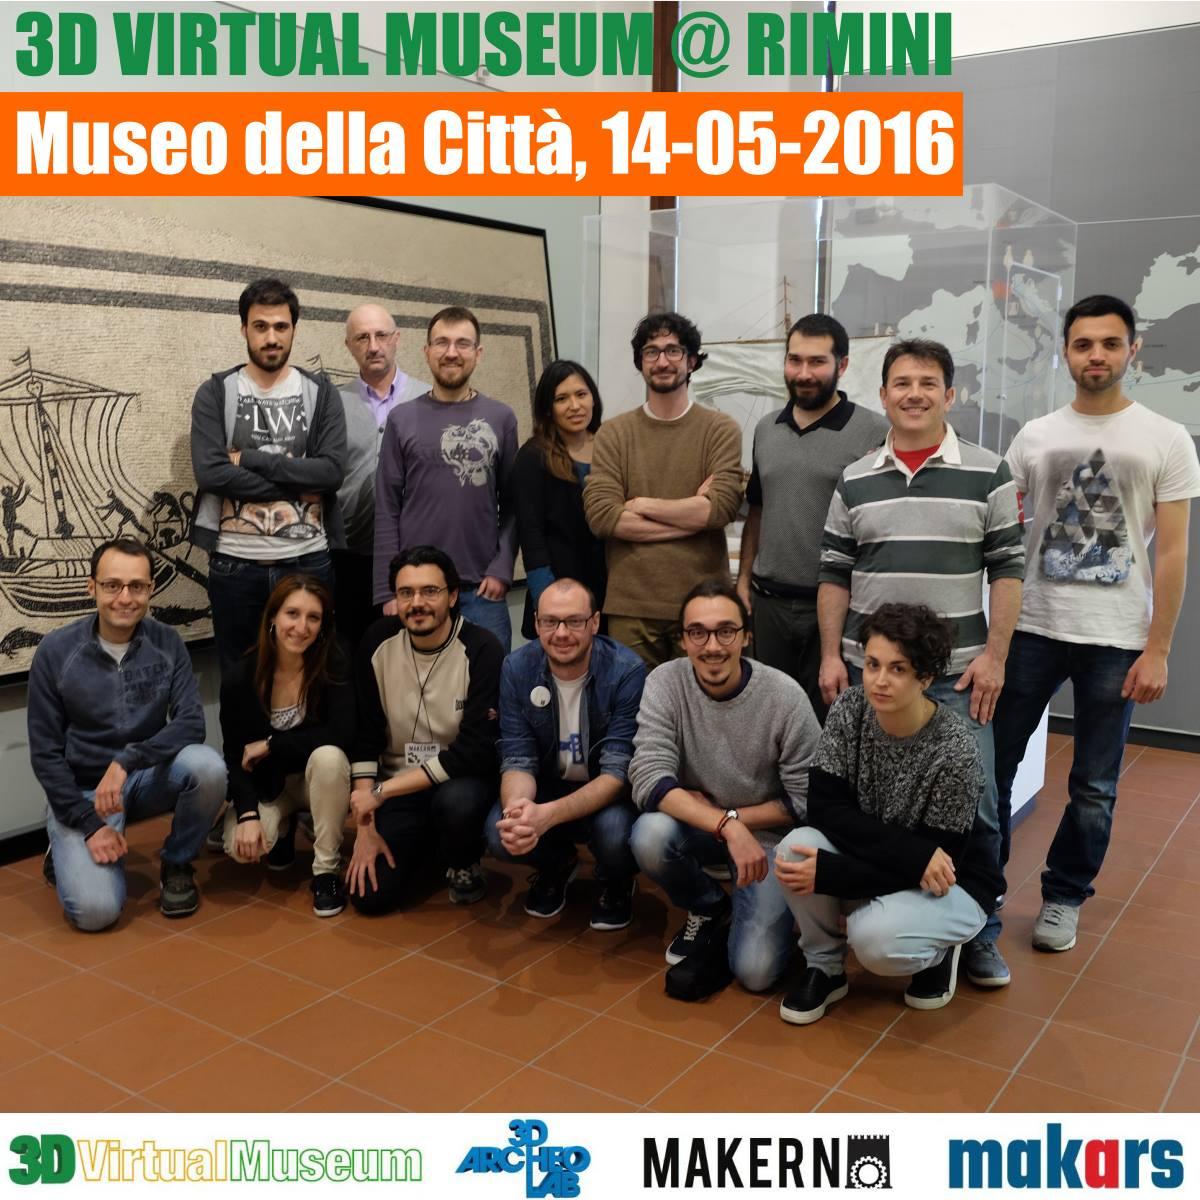 3D Virtual Museum a Rimini